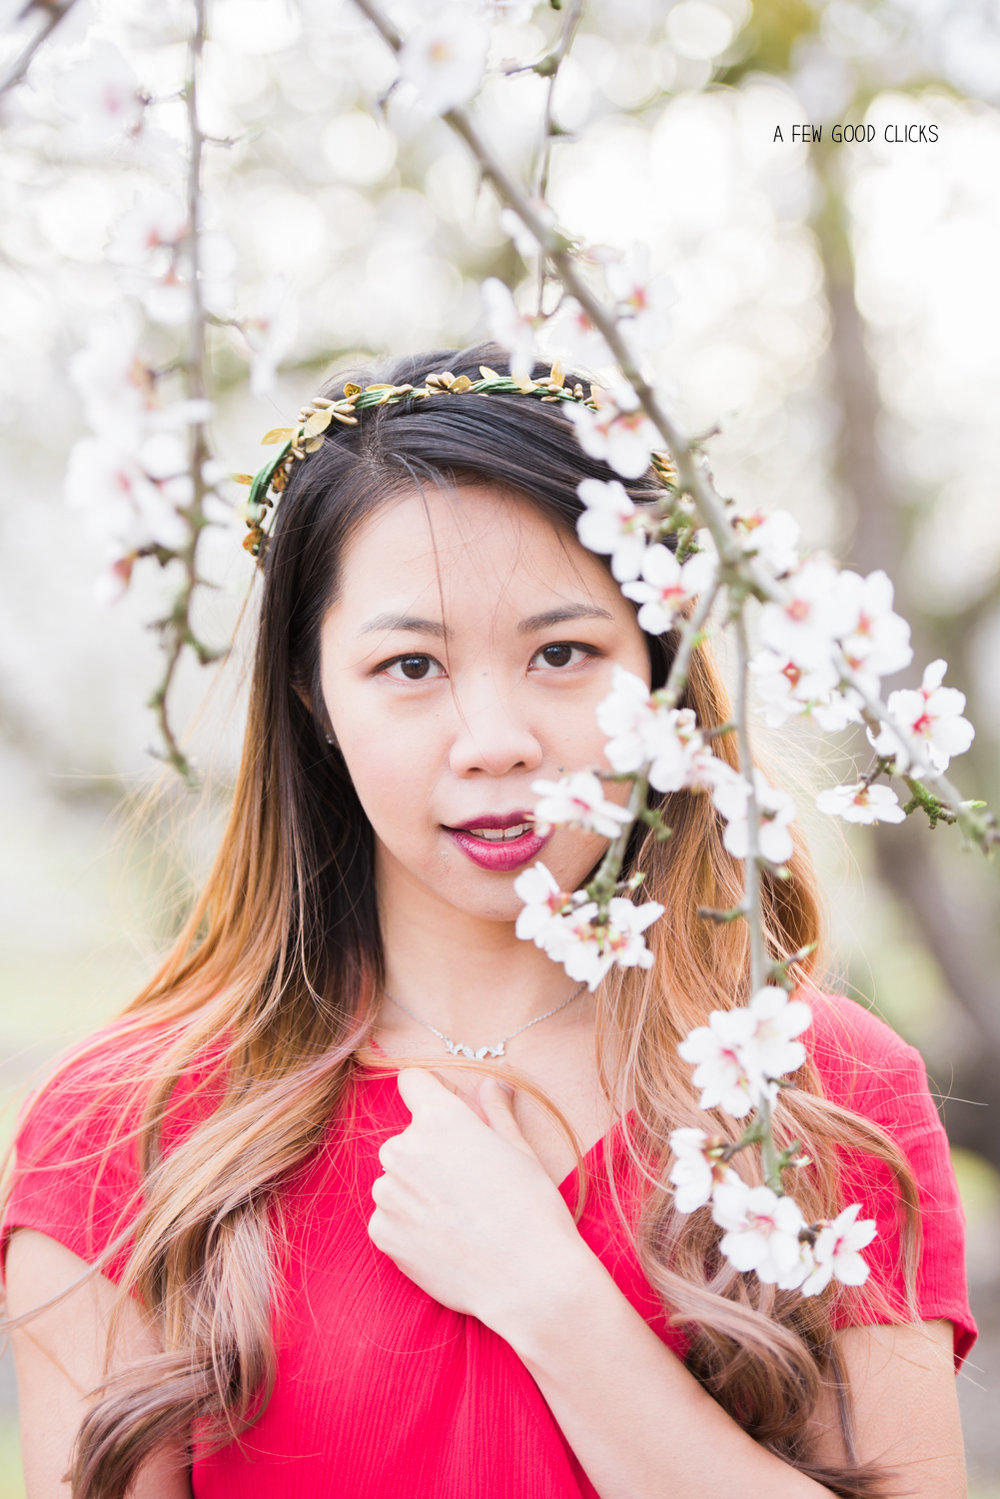 almond-blossom-lifestyle-portrait-photography-by-afewgoodclicks-net-121.jpg